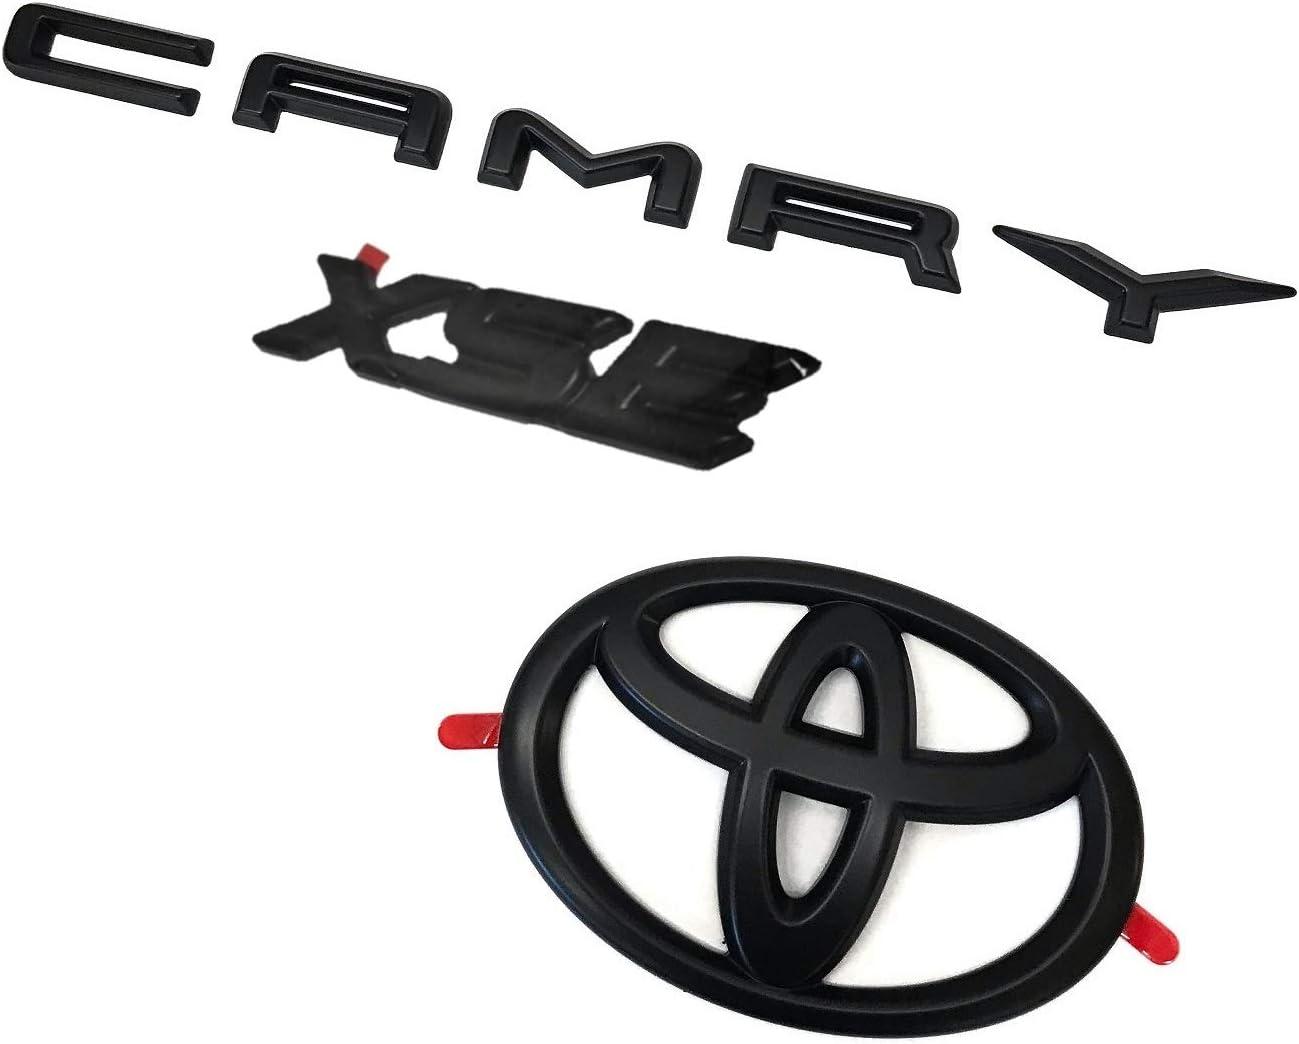 Genuine Toyota Camry XSE Blackout Emblem Overlays PT948-03190-02